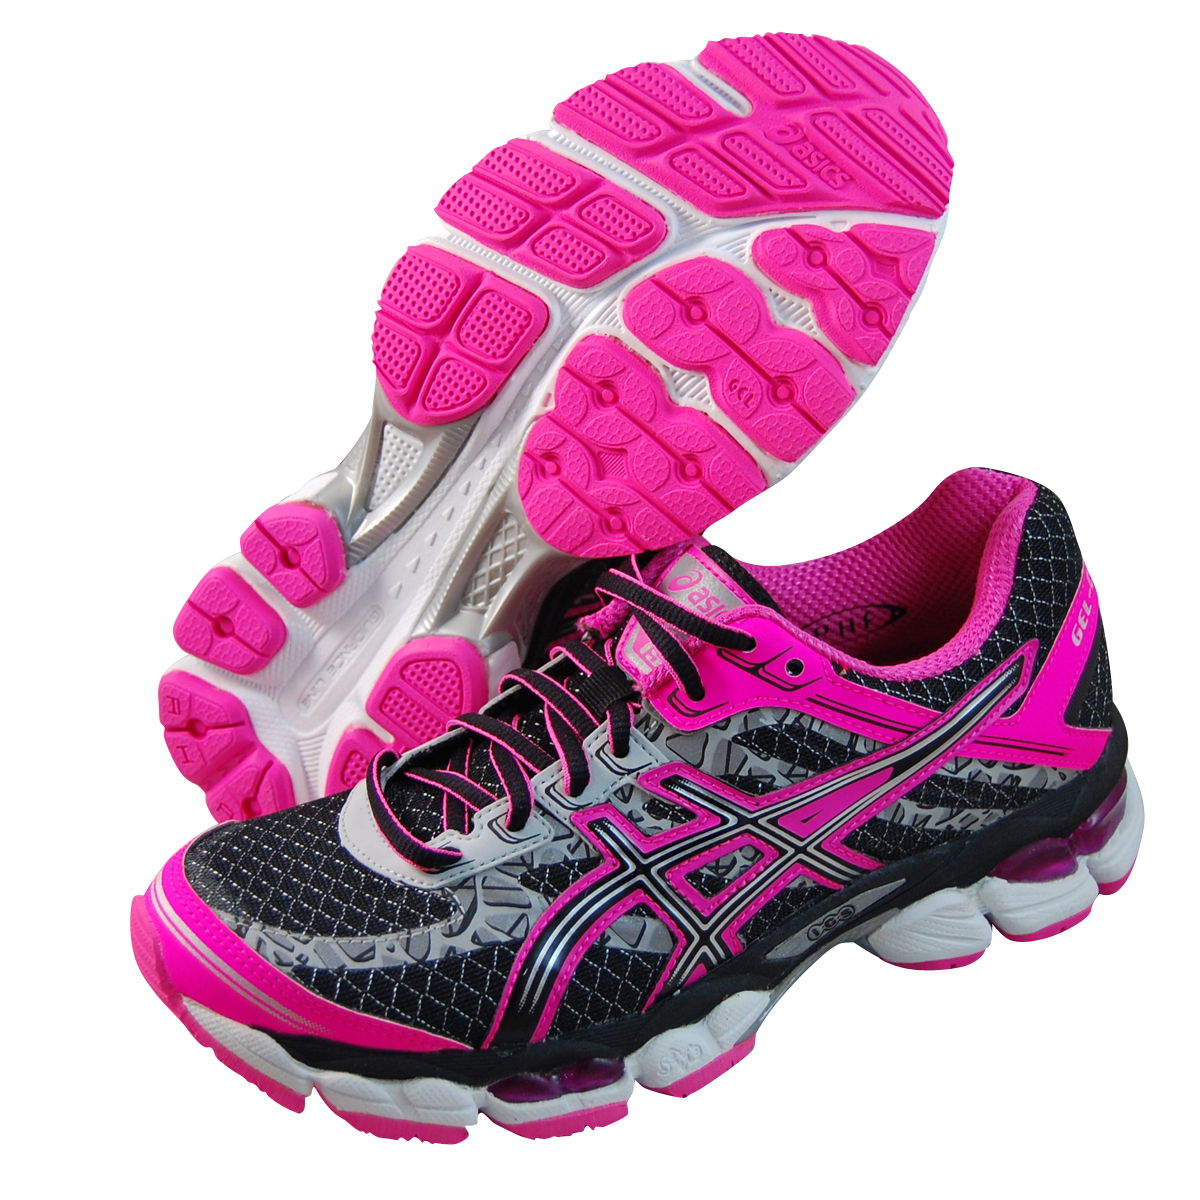 Asics Womens Gel Cumulus 15 Lite Show Pink running shoes